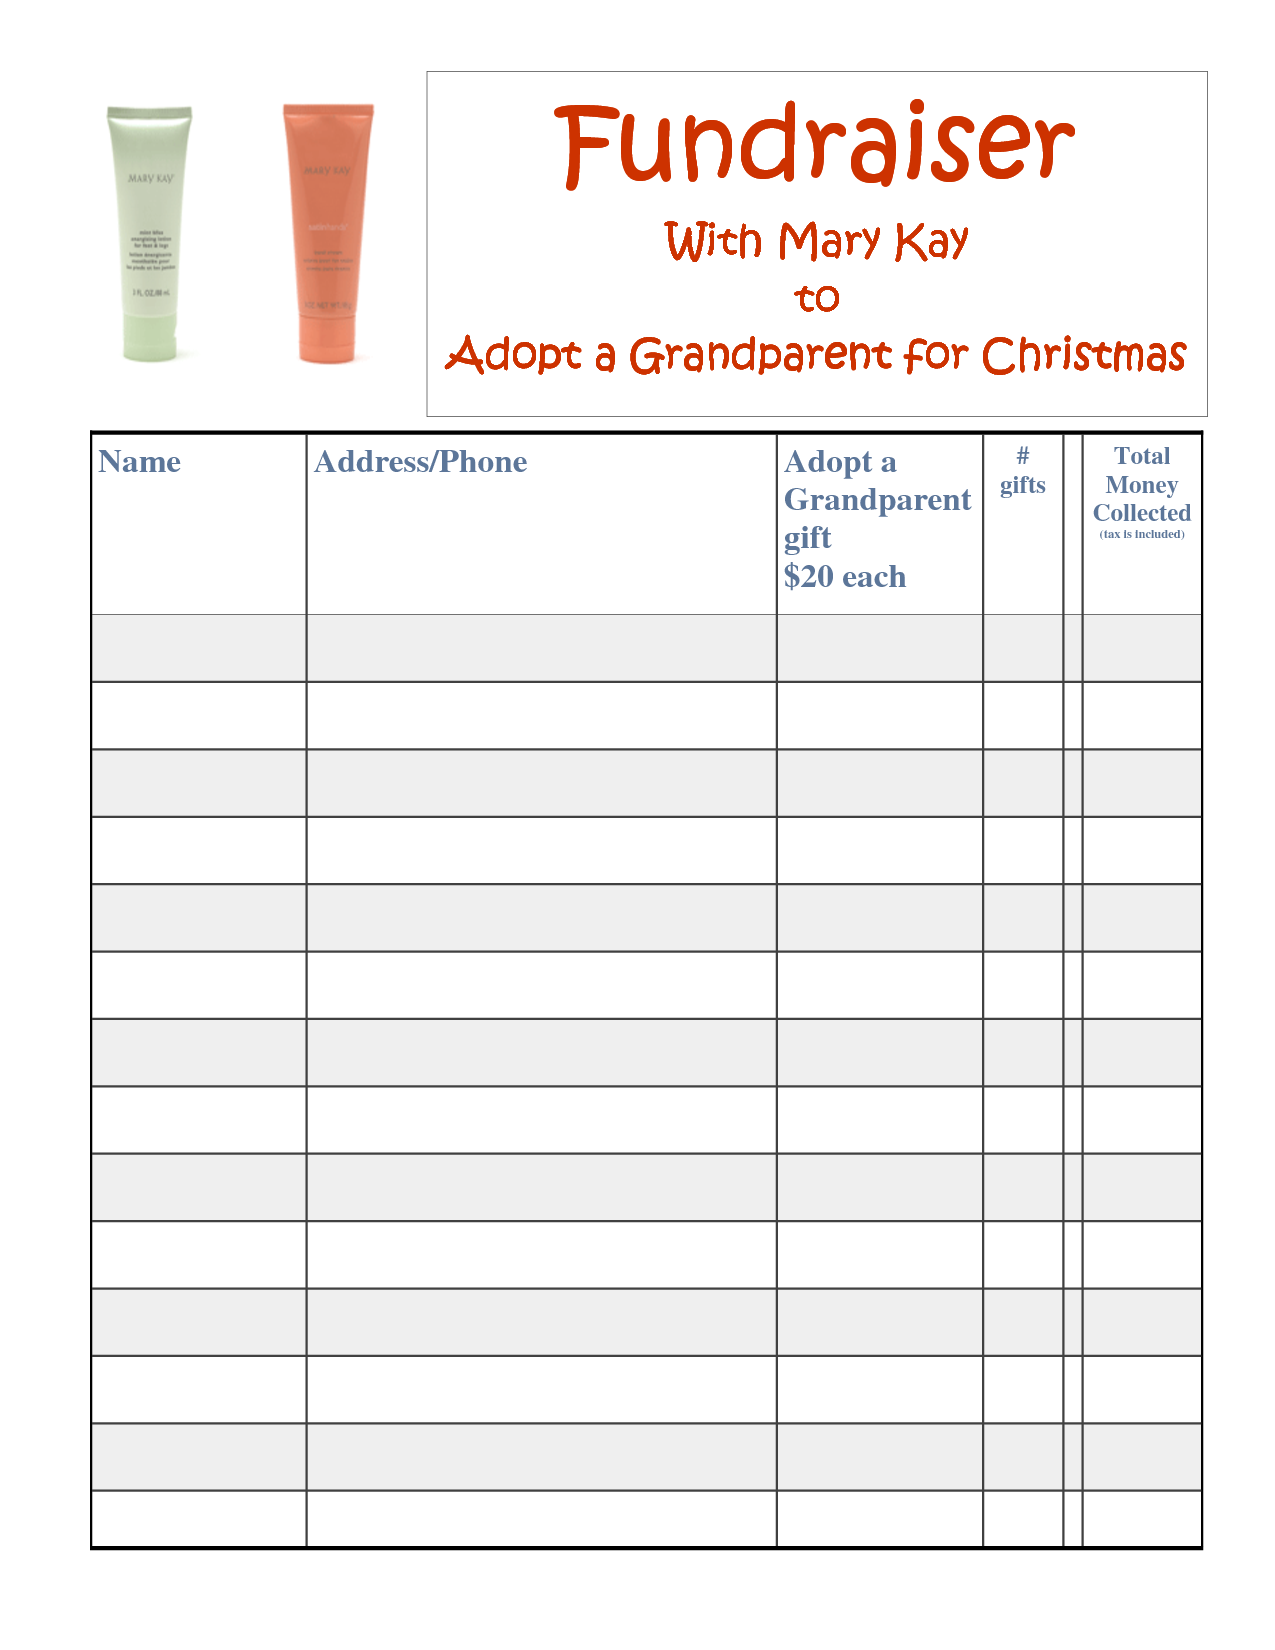 Fundraiser sheets templates asafonec sciox Choice Image